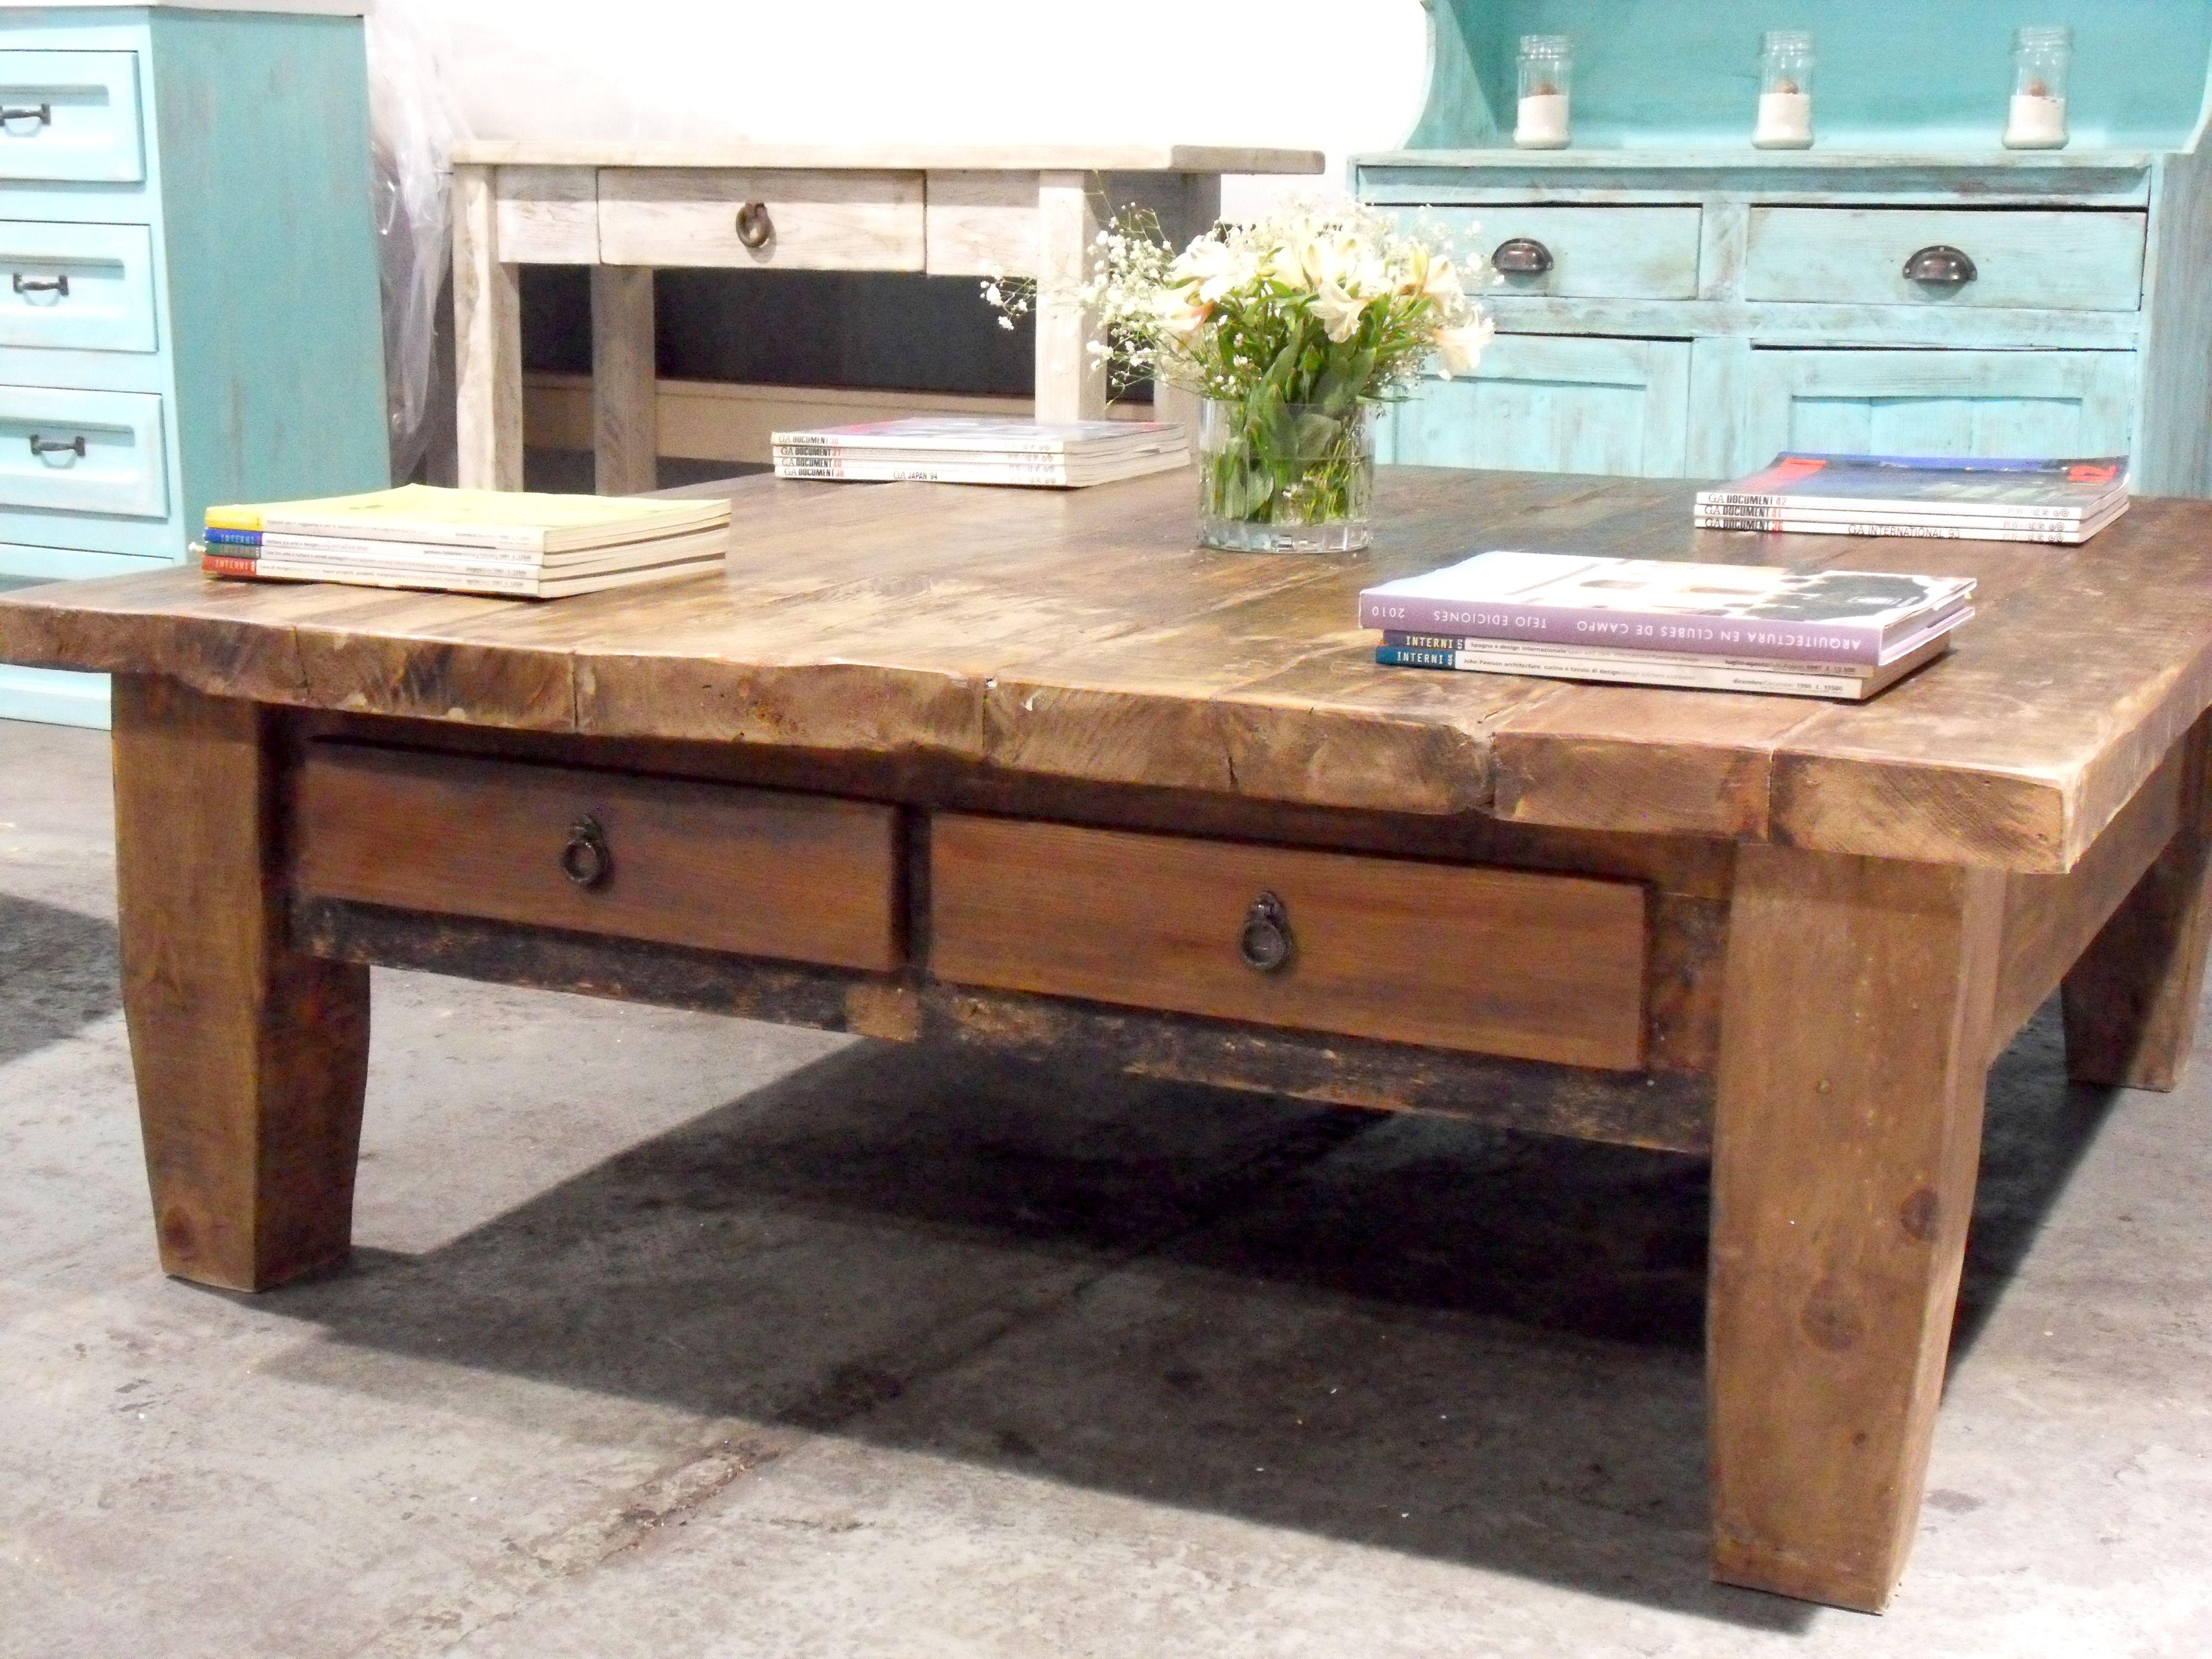 Pin de Sebastian Amarelle en Muebles en madera | Pinterest | De ...